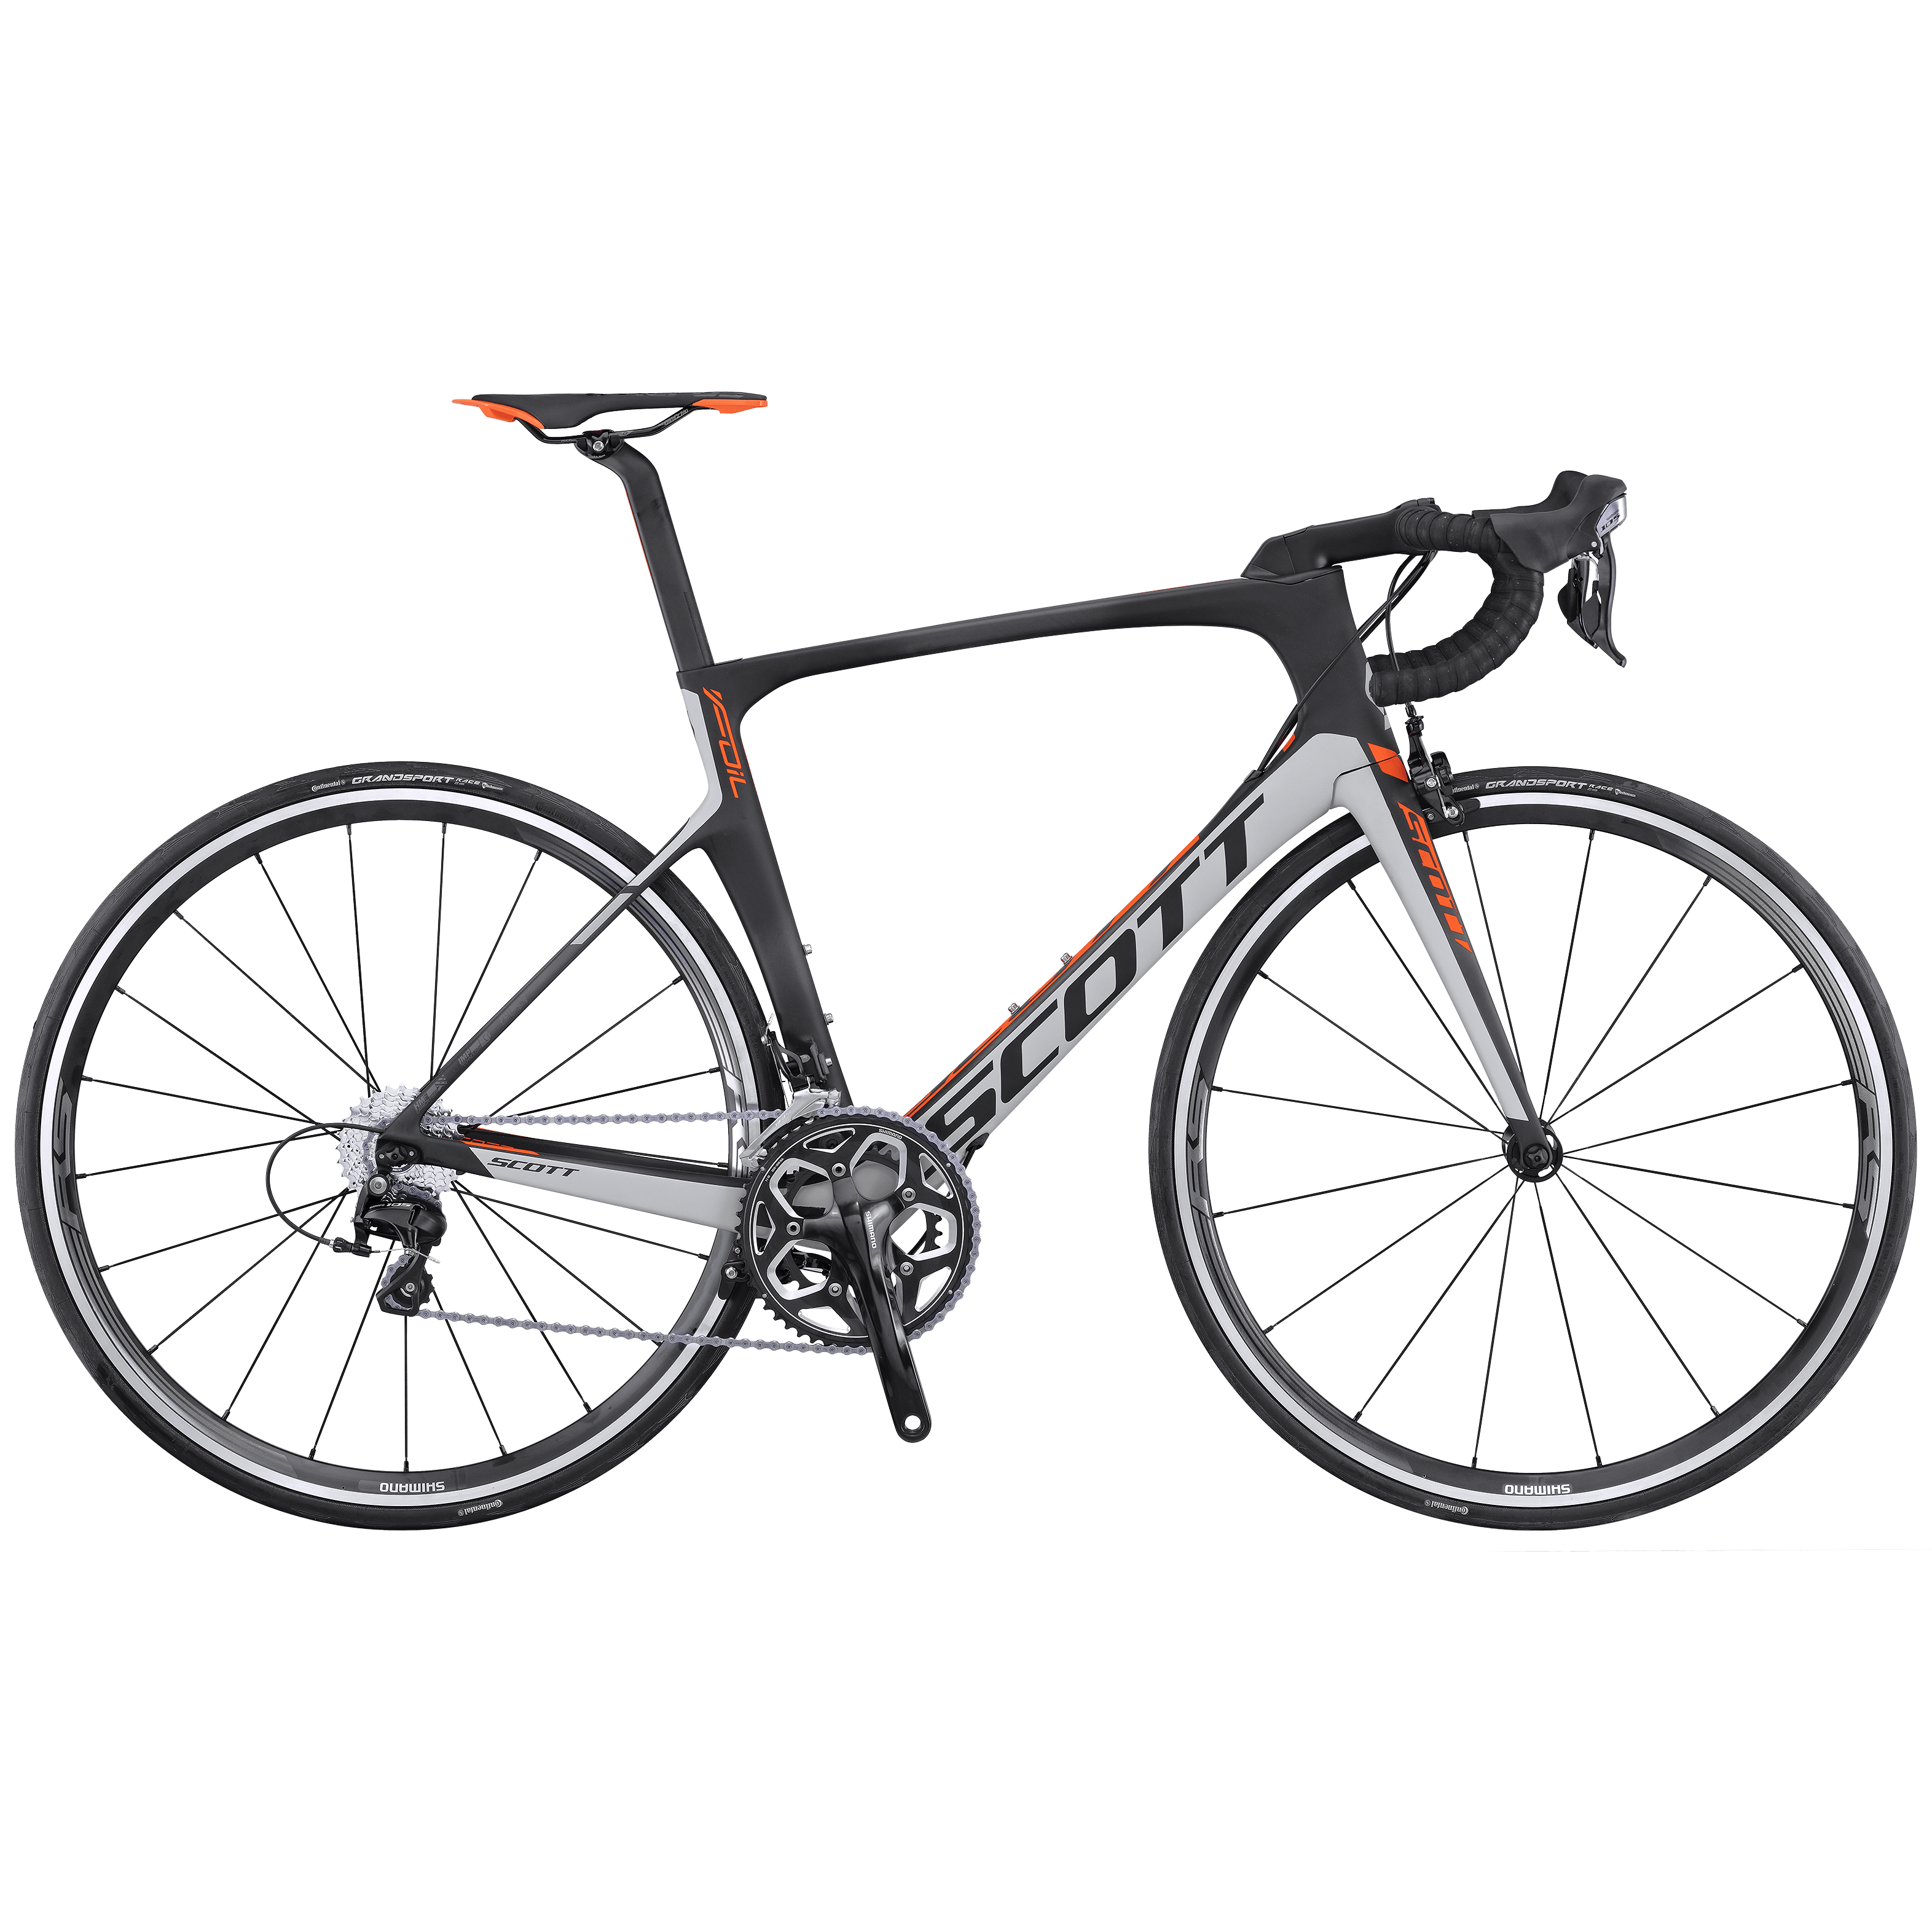 Scott Road Bikes Scott Foil 30 2016 At Cycle Division